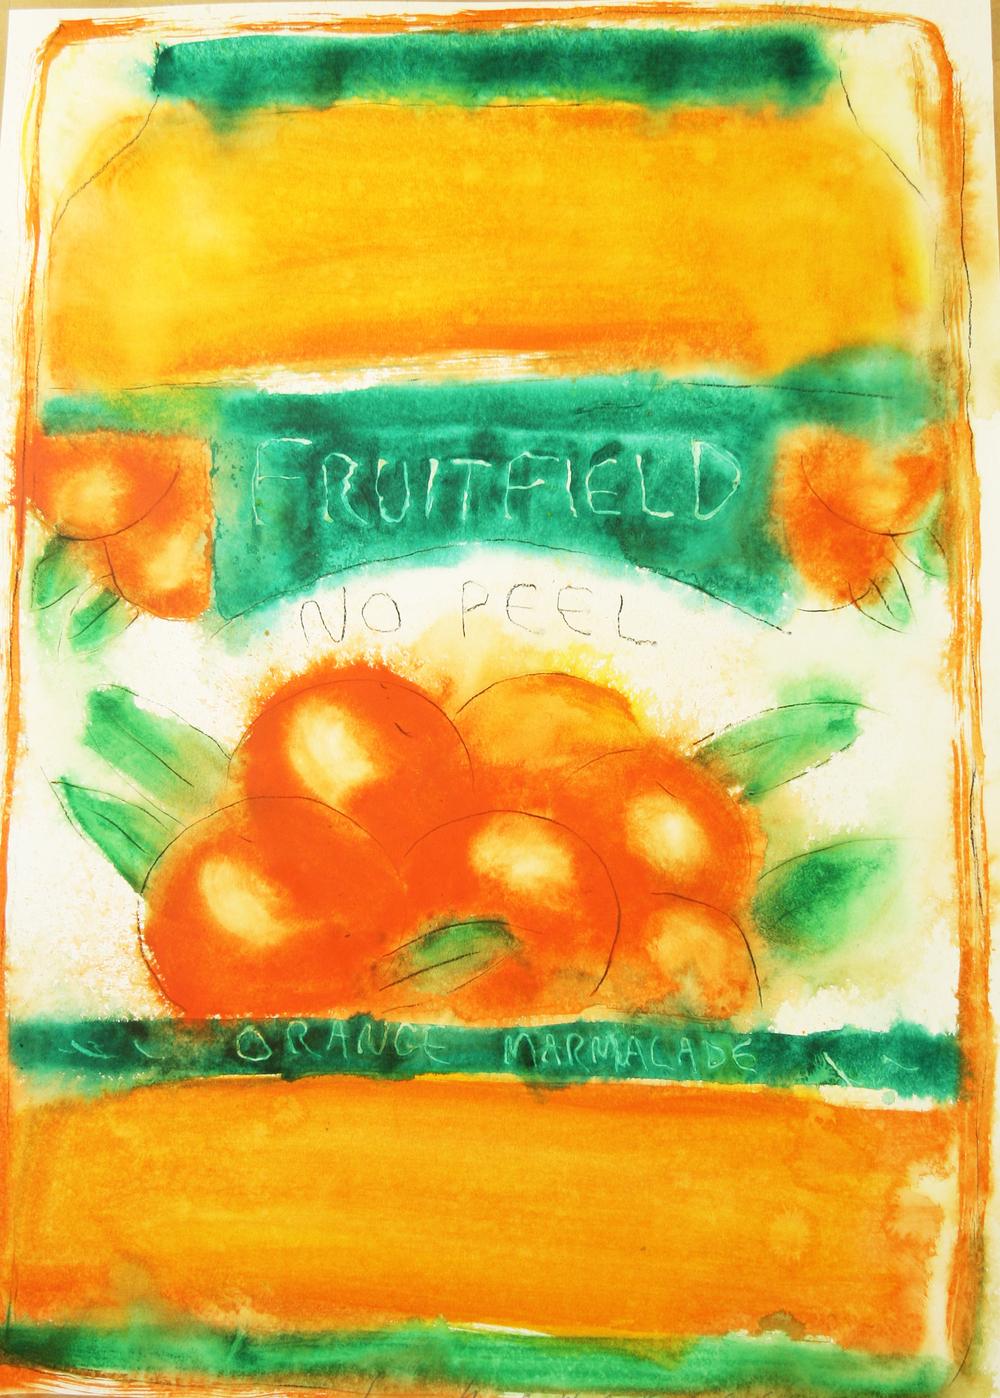 Neil Shawcross_-_Fruitfield Orange Marmalade_acrylic on paper_102 x 76cm.jpg